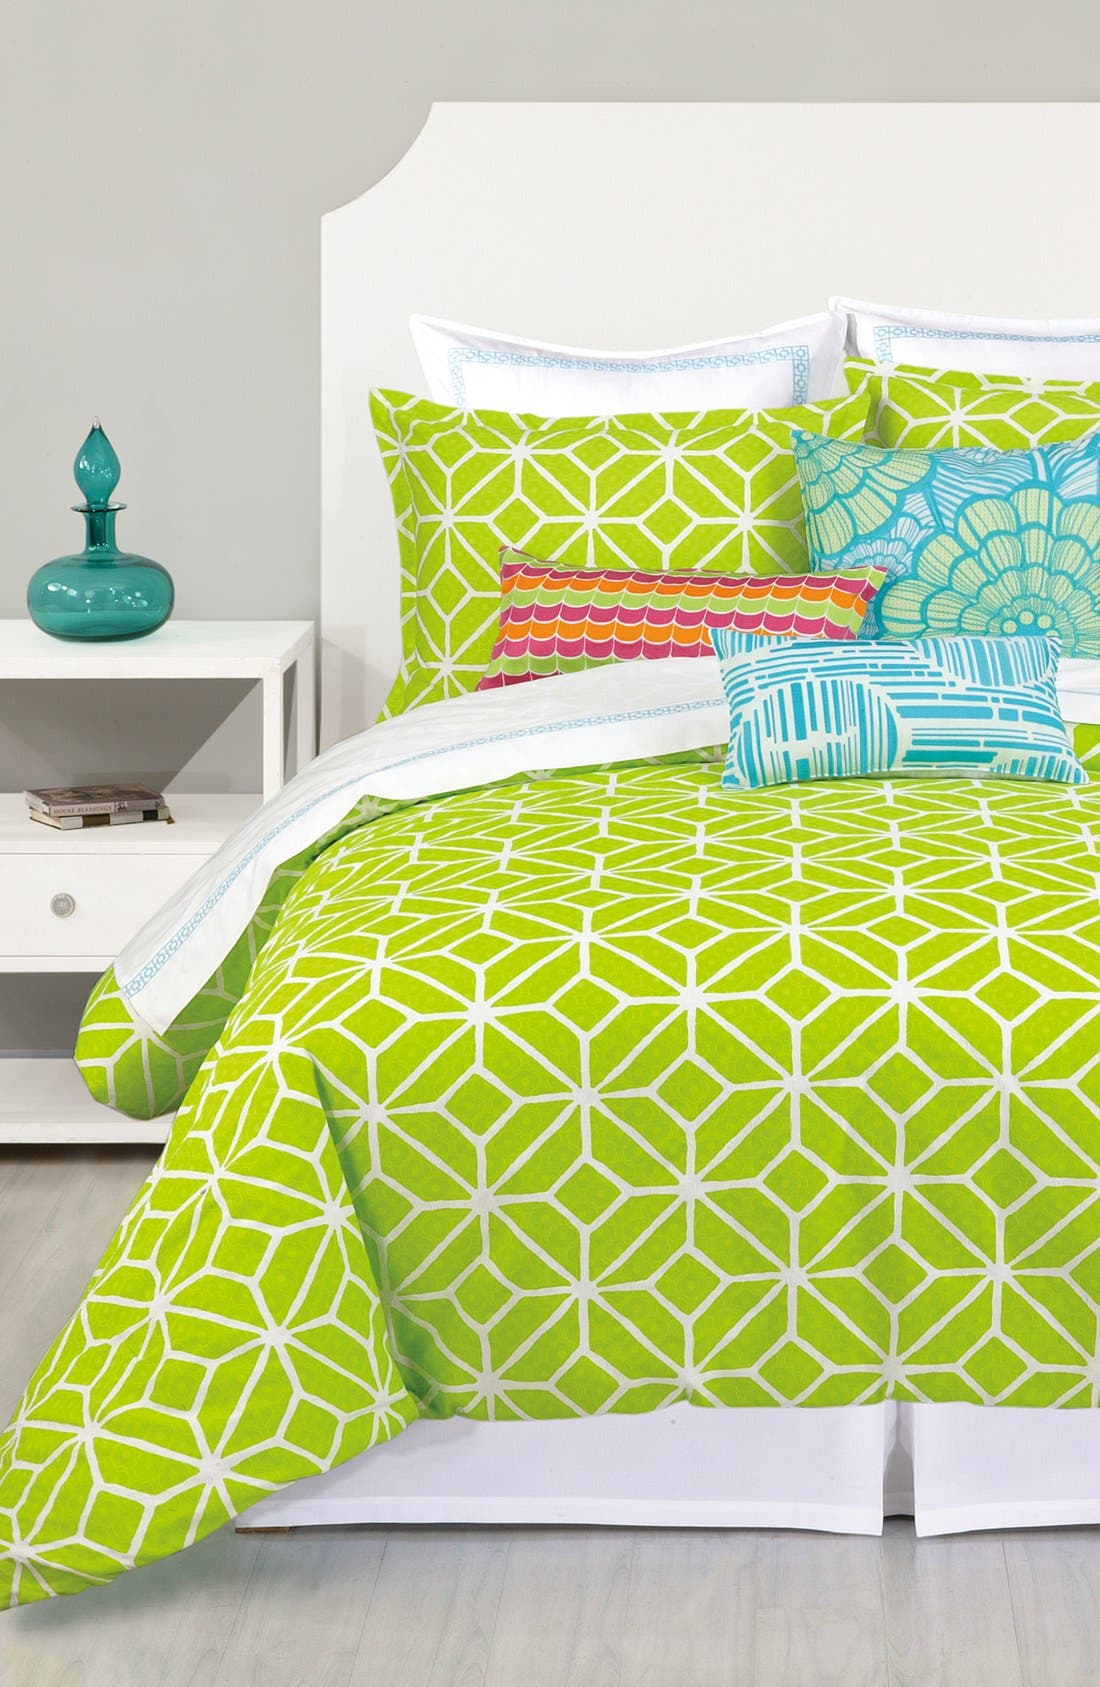 Main Image - Trina Turk 'Trellis' 400 Thread Count Comforter & Shams